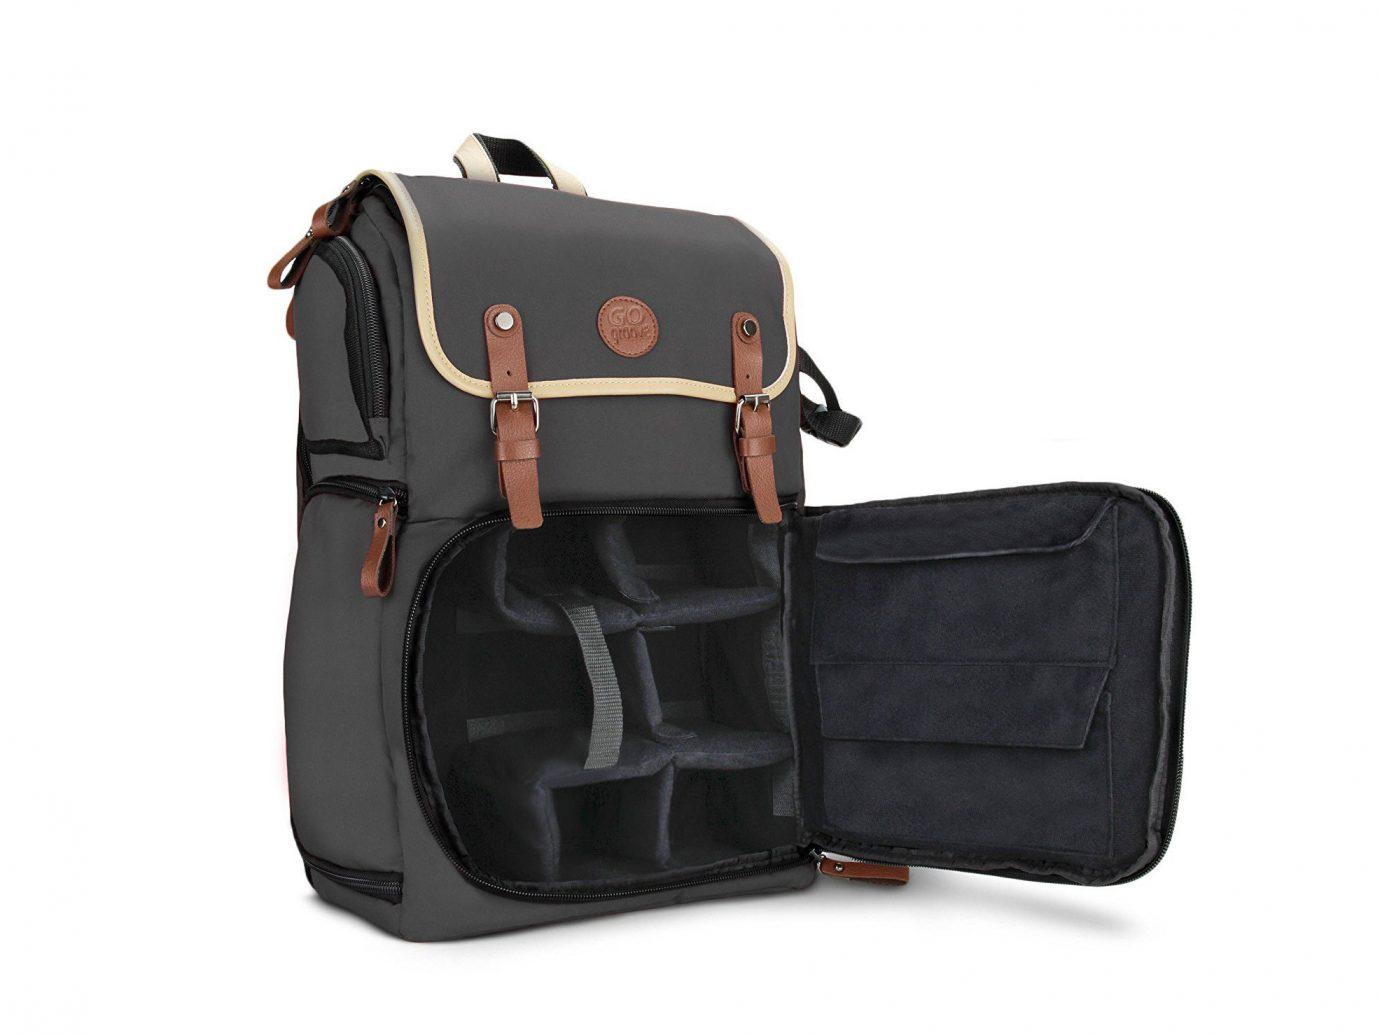 Travel Shop luggage suitcase bag accessory suit piece product case messenger bag leather product design baggage hand luggage luggage & bags shoulder bag brand